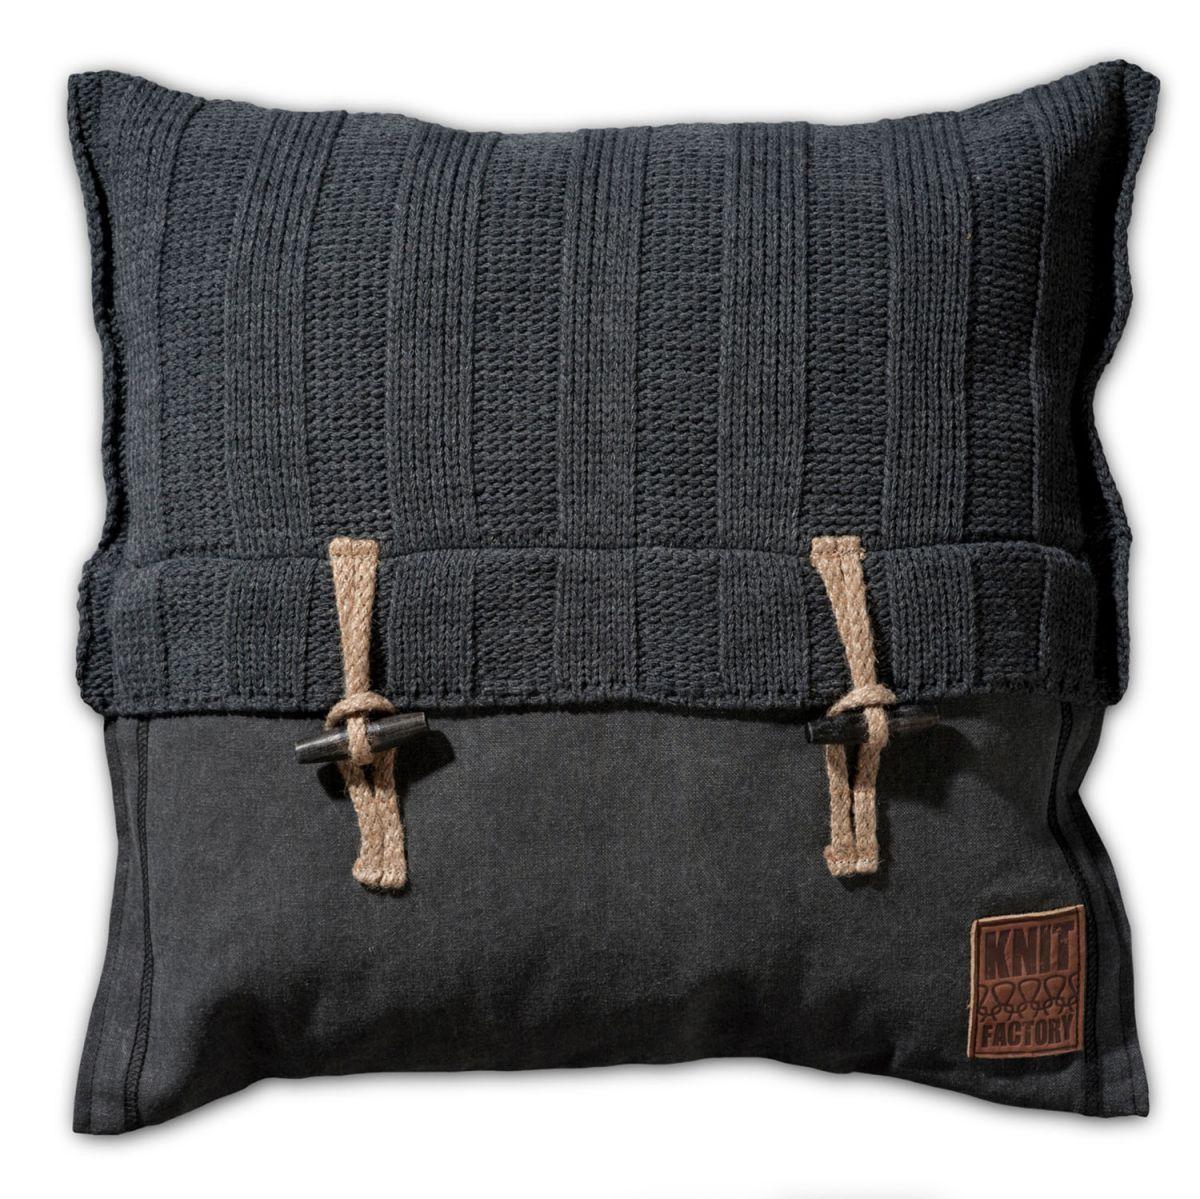 6x6 rib cushion anthracite 50x50